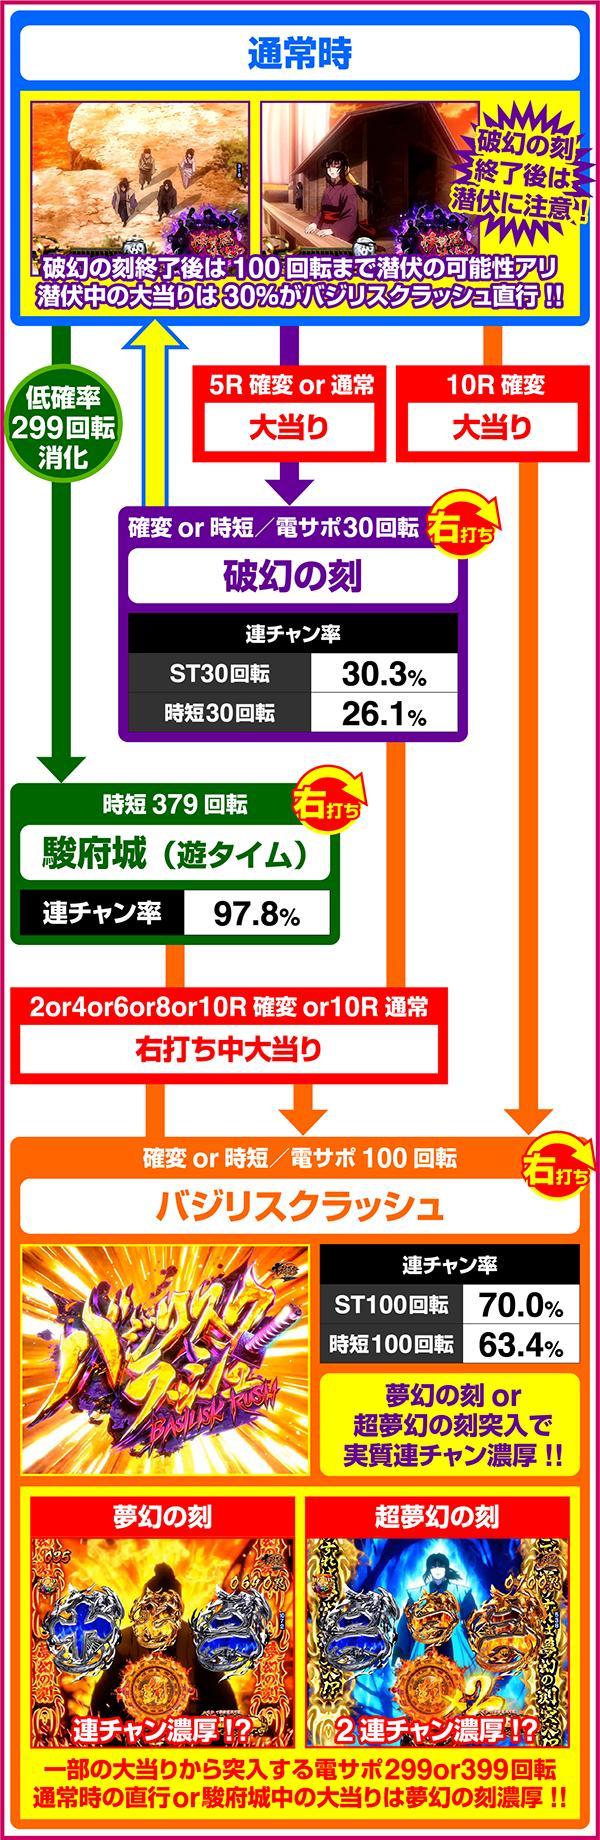 Pバジリスク〜甲賀忍法帖〜2 朧の章 メーシー ゲームフロー